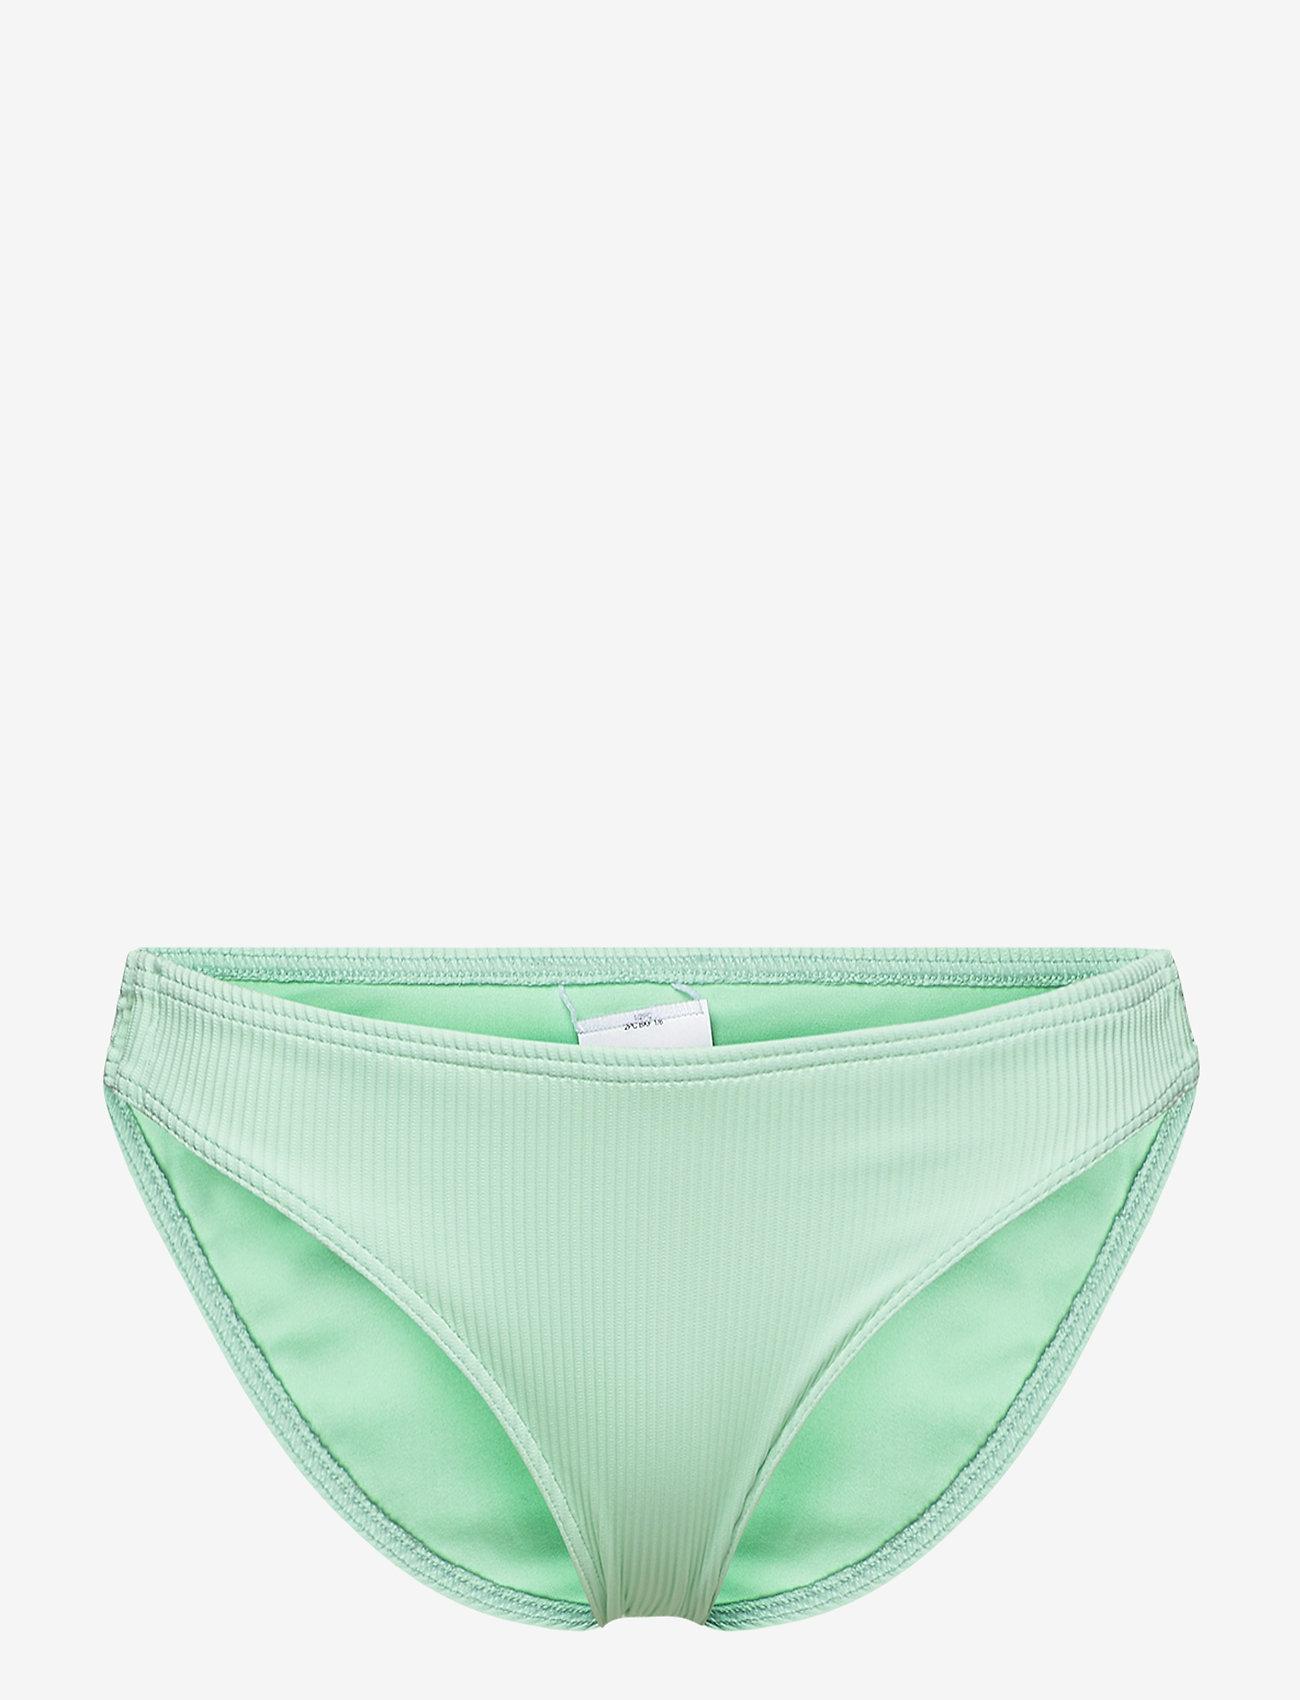 Roxy - MIND OF FREEDOM REGULAR BOTTOM - majtki bikini - brook green - 1